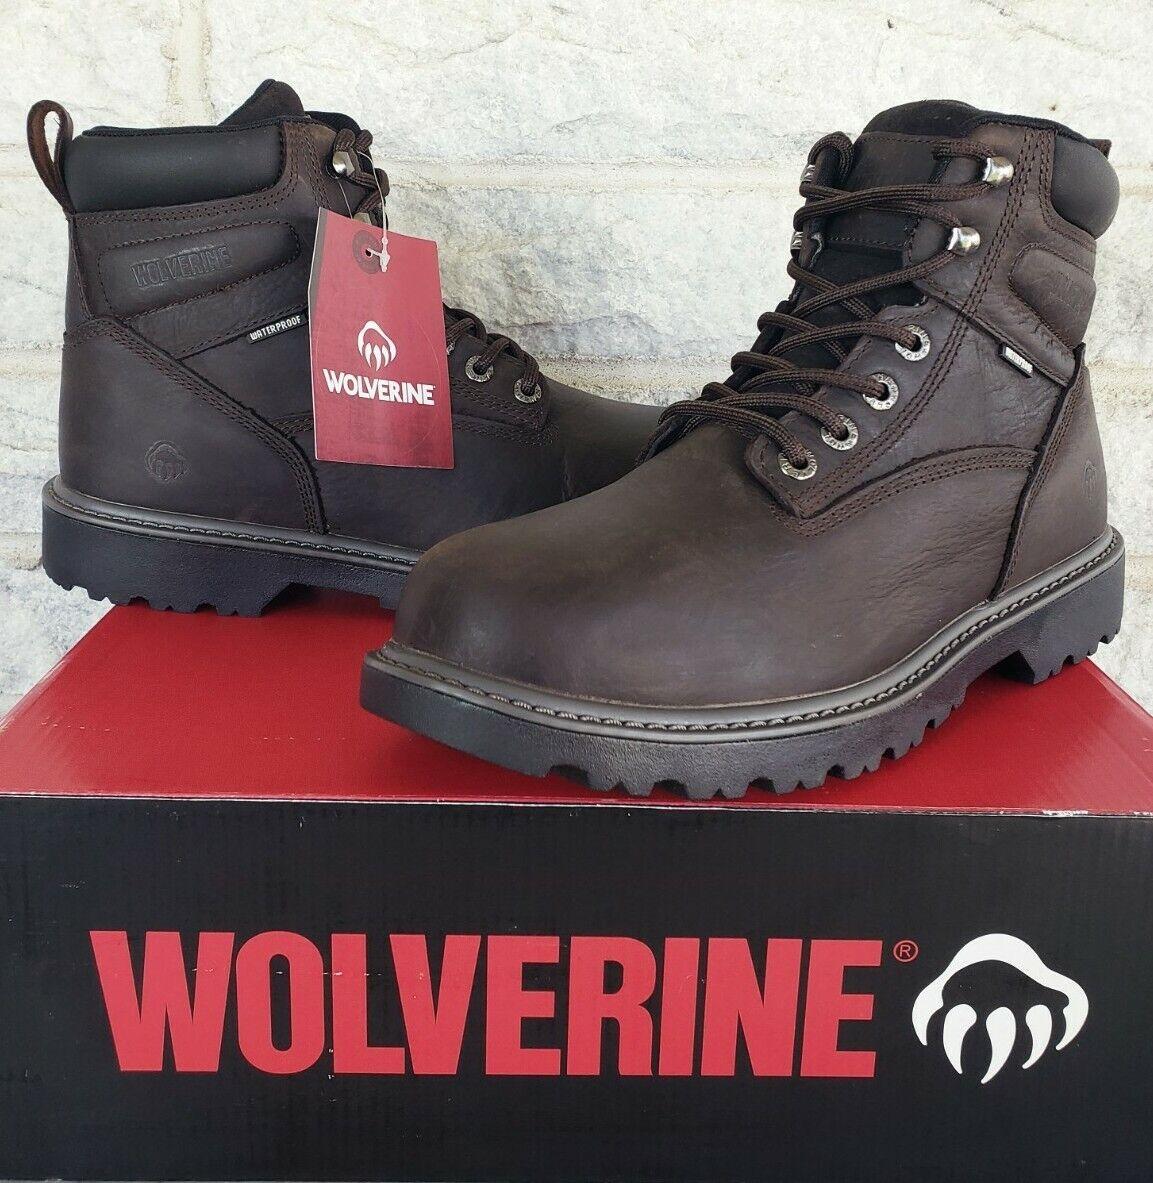 "Wolverine Mens Floorhand 6"" Waterproof Soft Toe Work Boots Sz 10 EW Brown W10643"